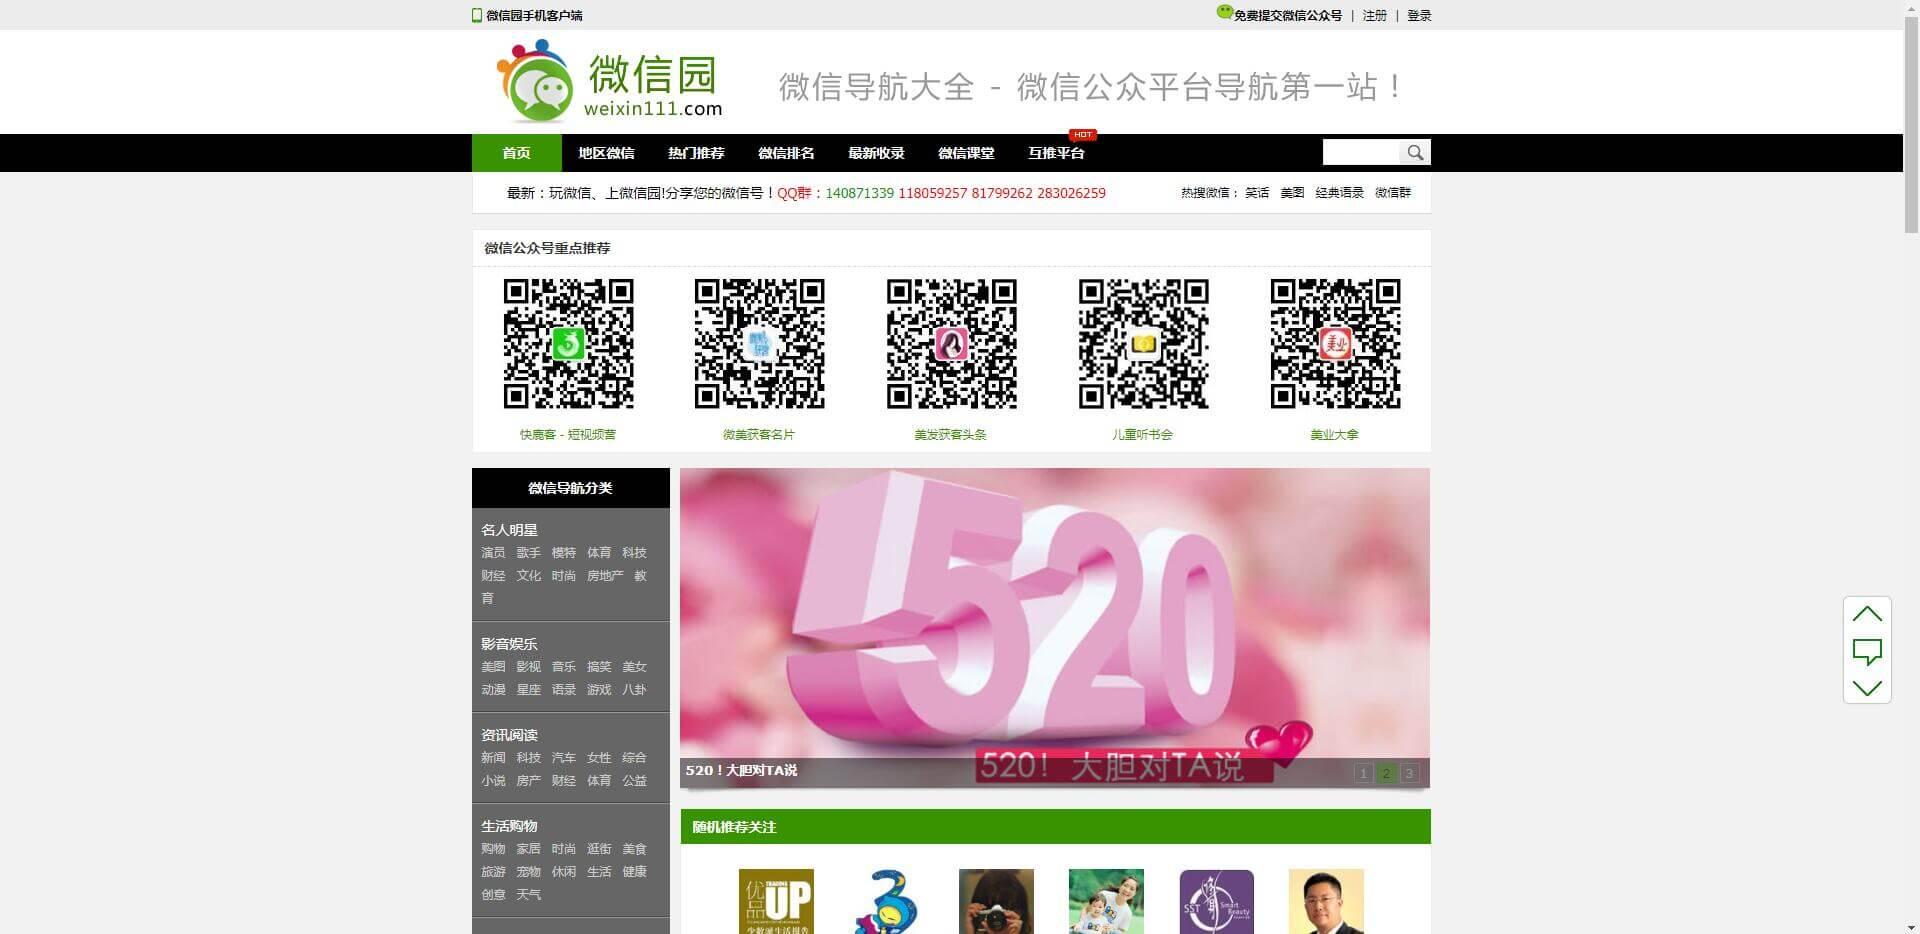 微信园_www.weixin111.com